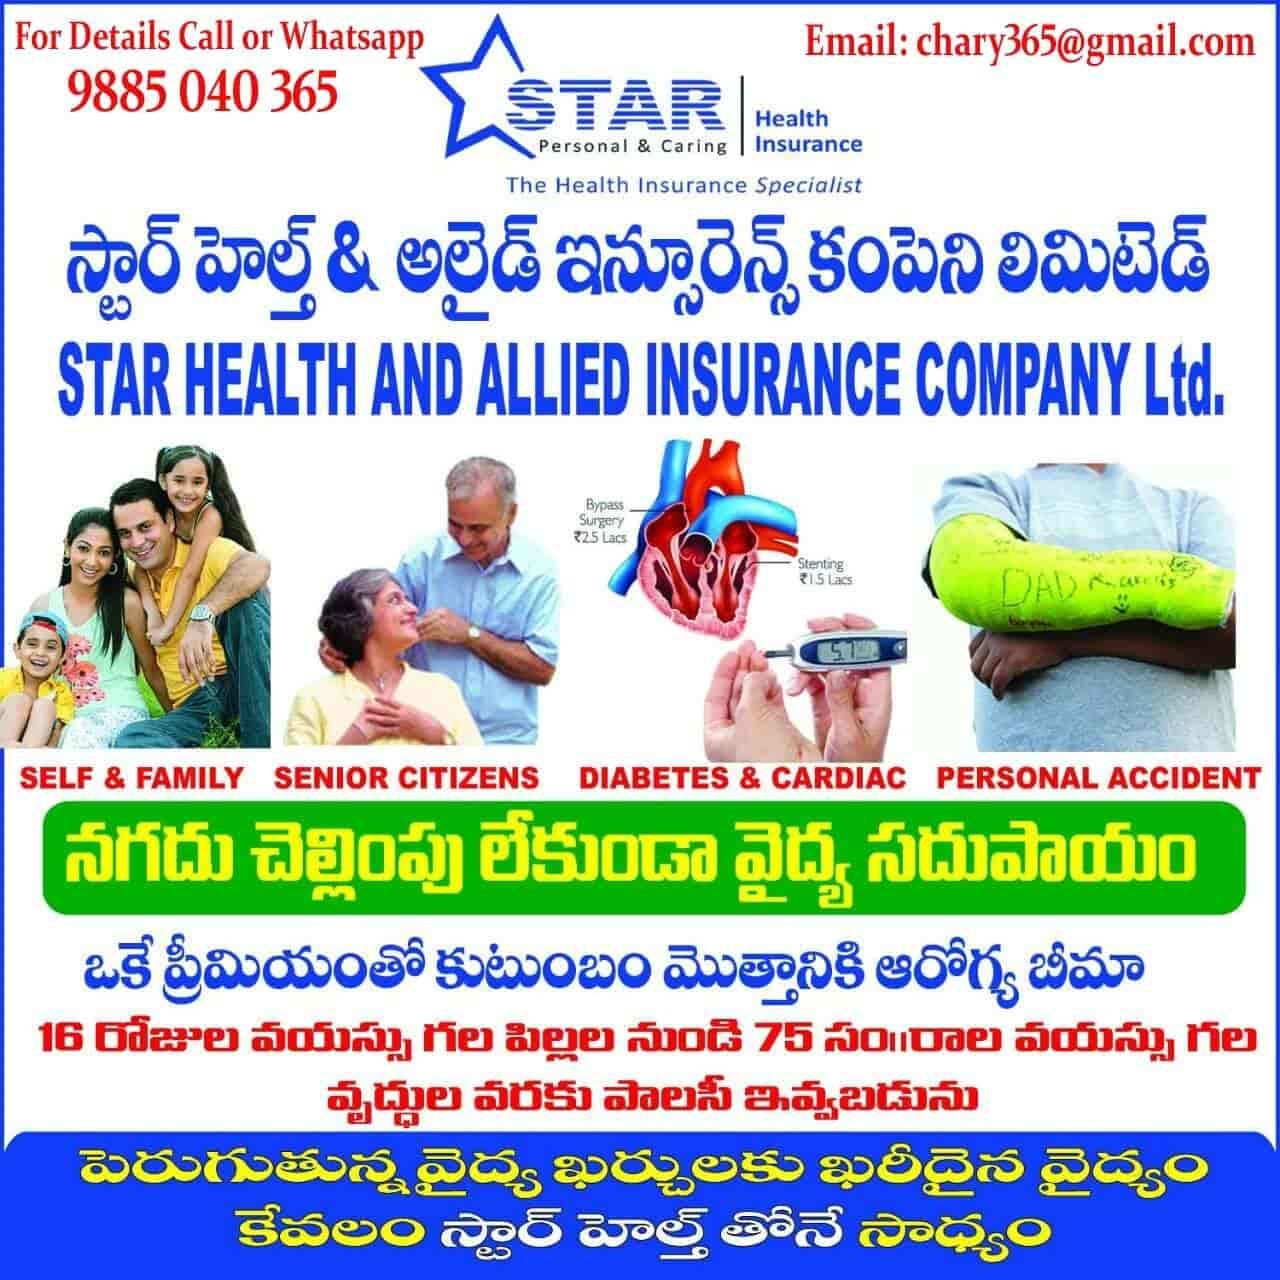 Star Health Allied Insurance Company Ltd Nalgonda Ho Insurance Companies In Nalgonda Justdial